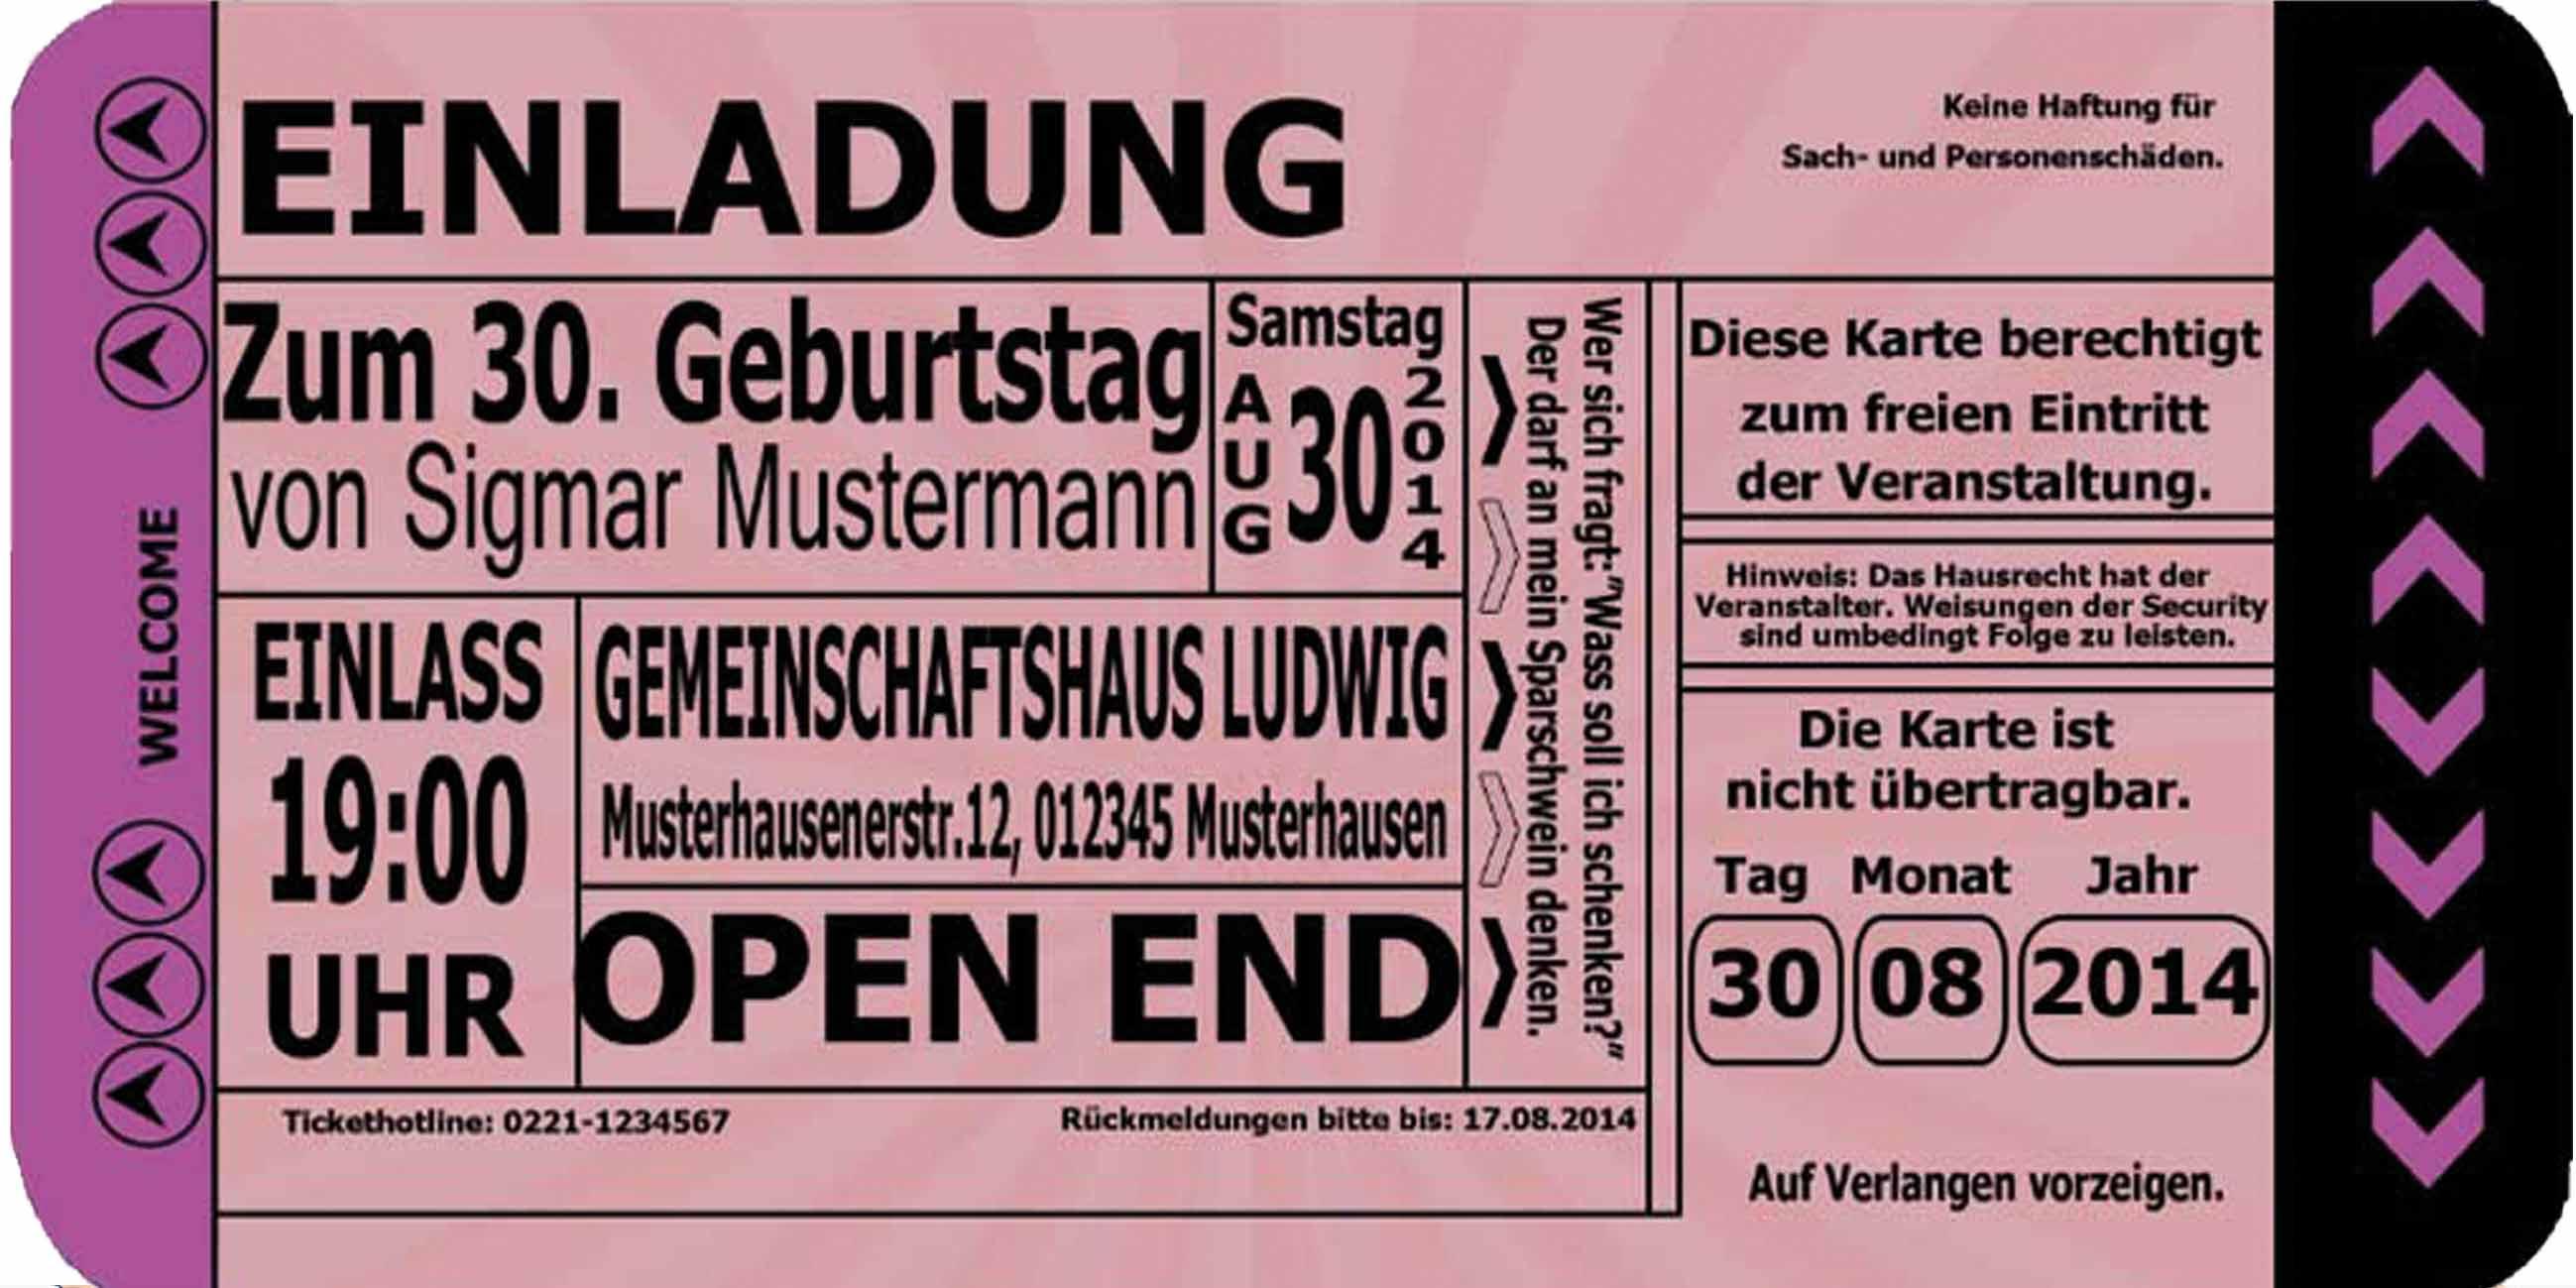 Poza. Einladungskarte U0027 ...